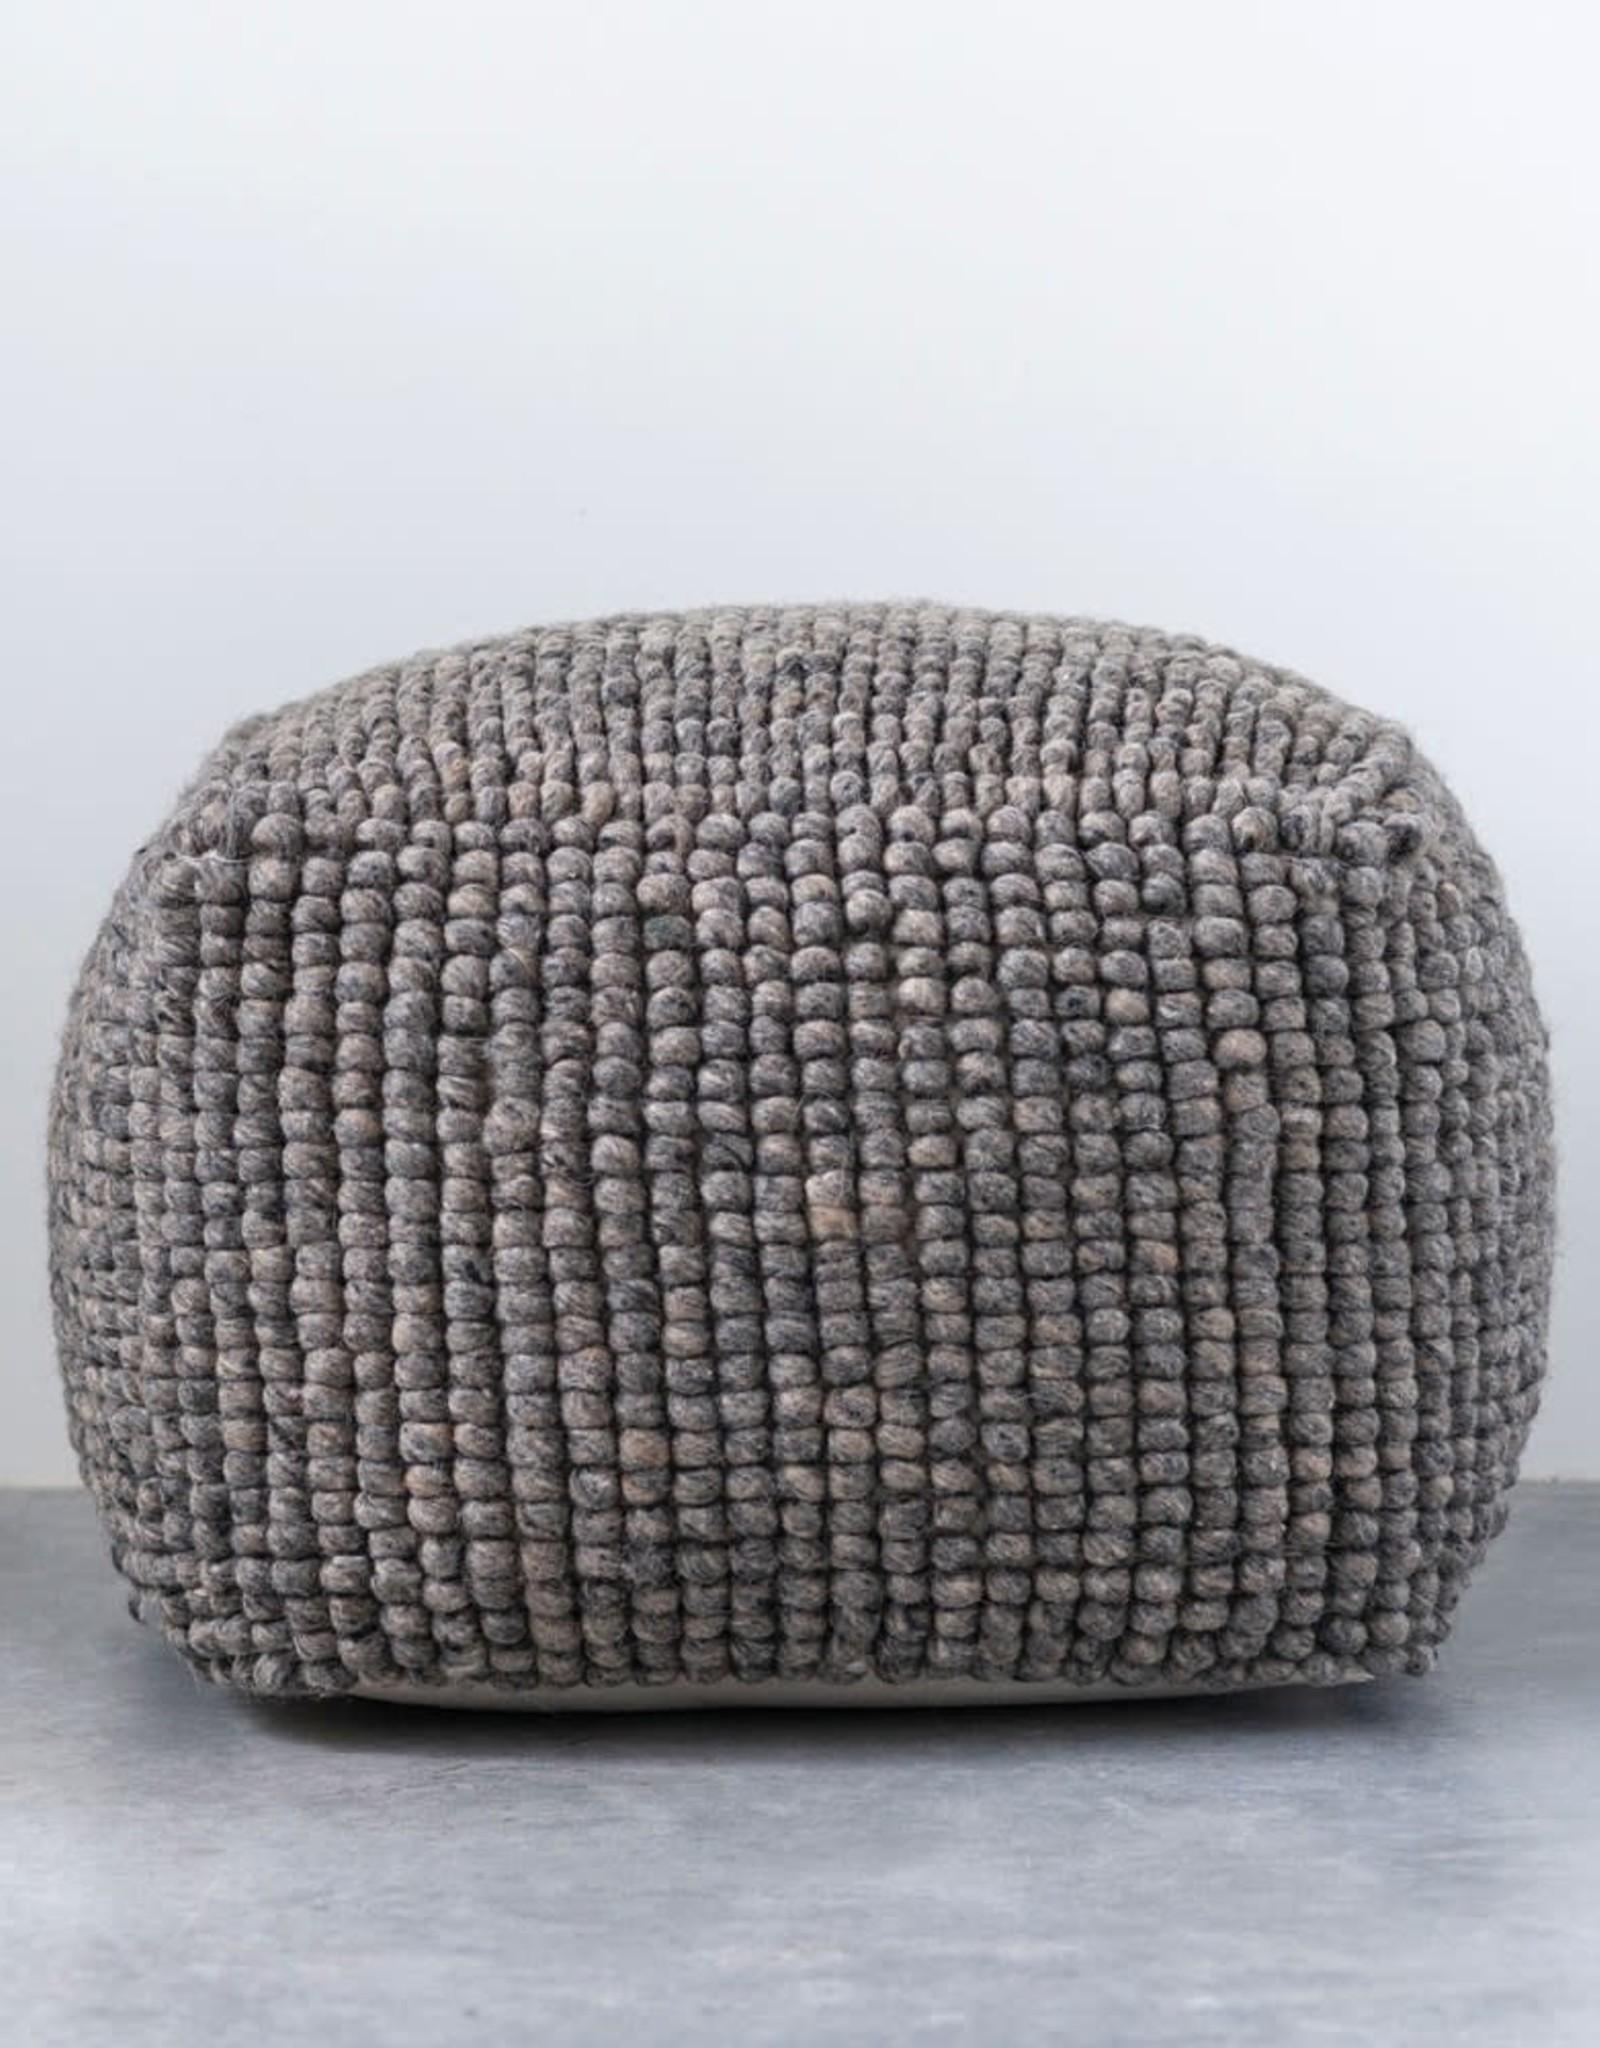 New Zealand Grey Wool Pouf